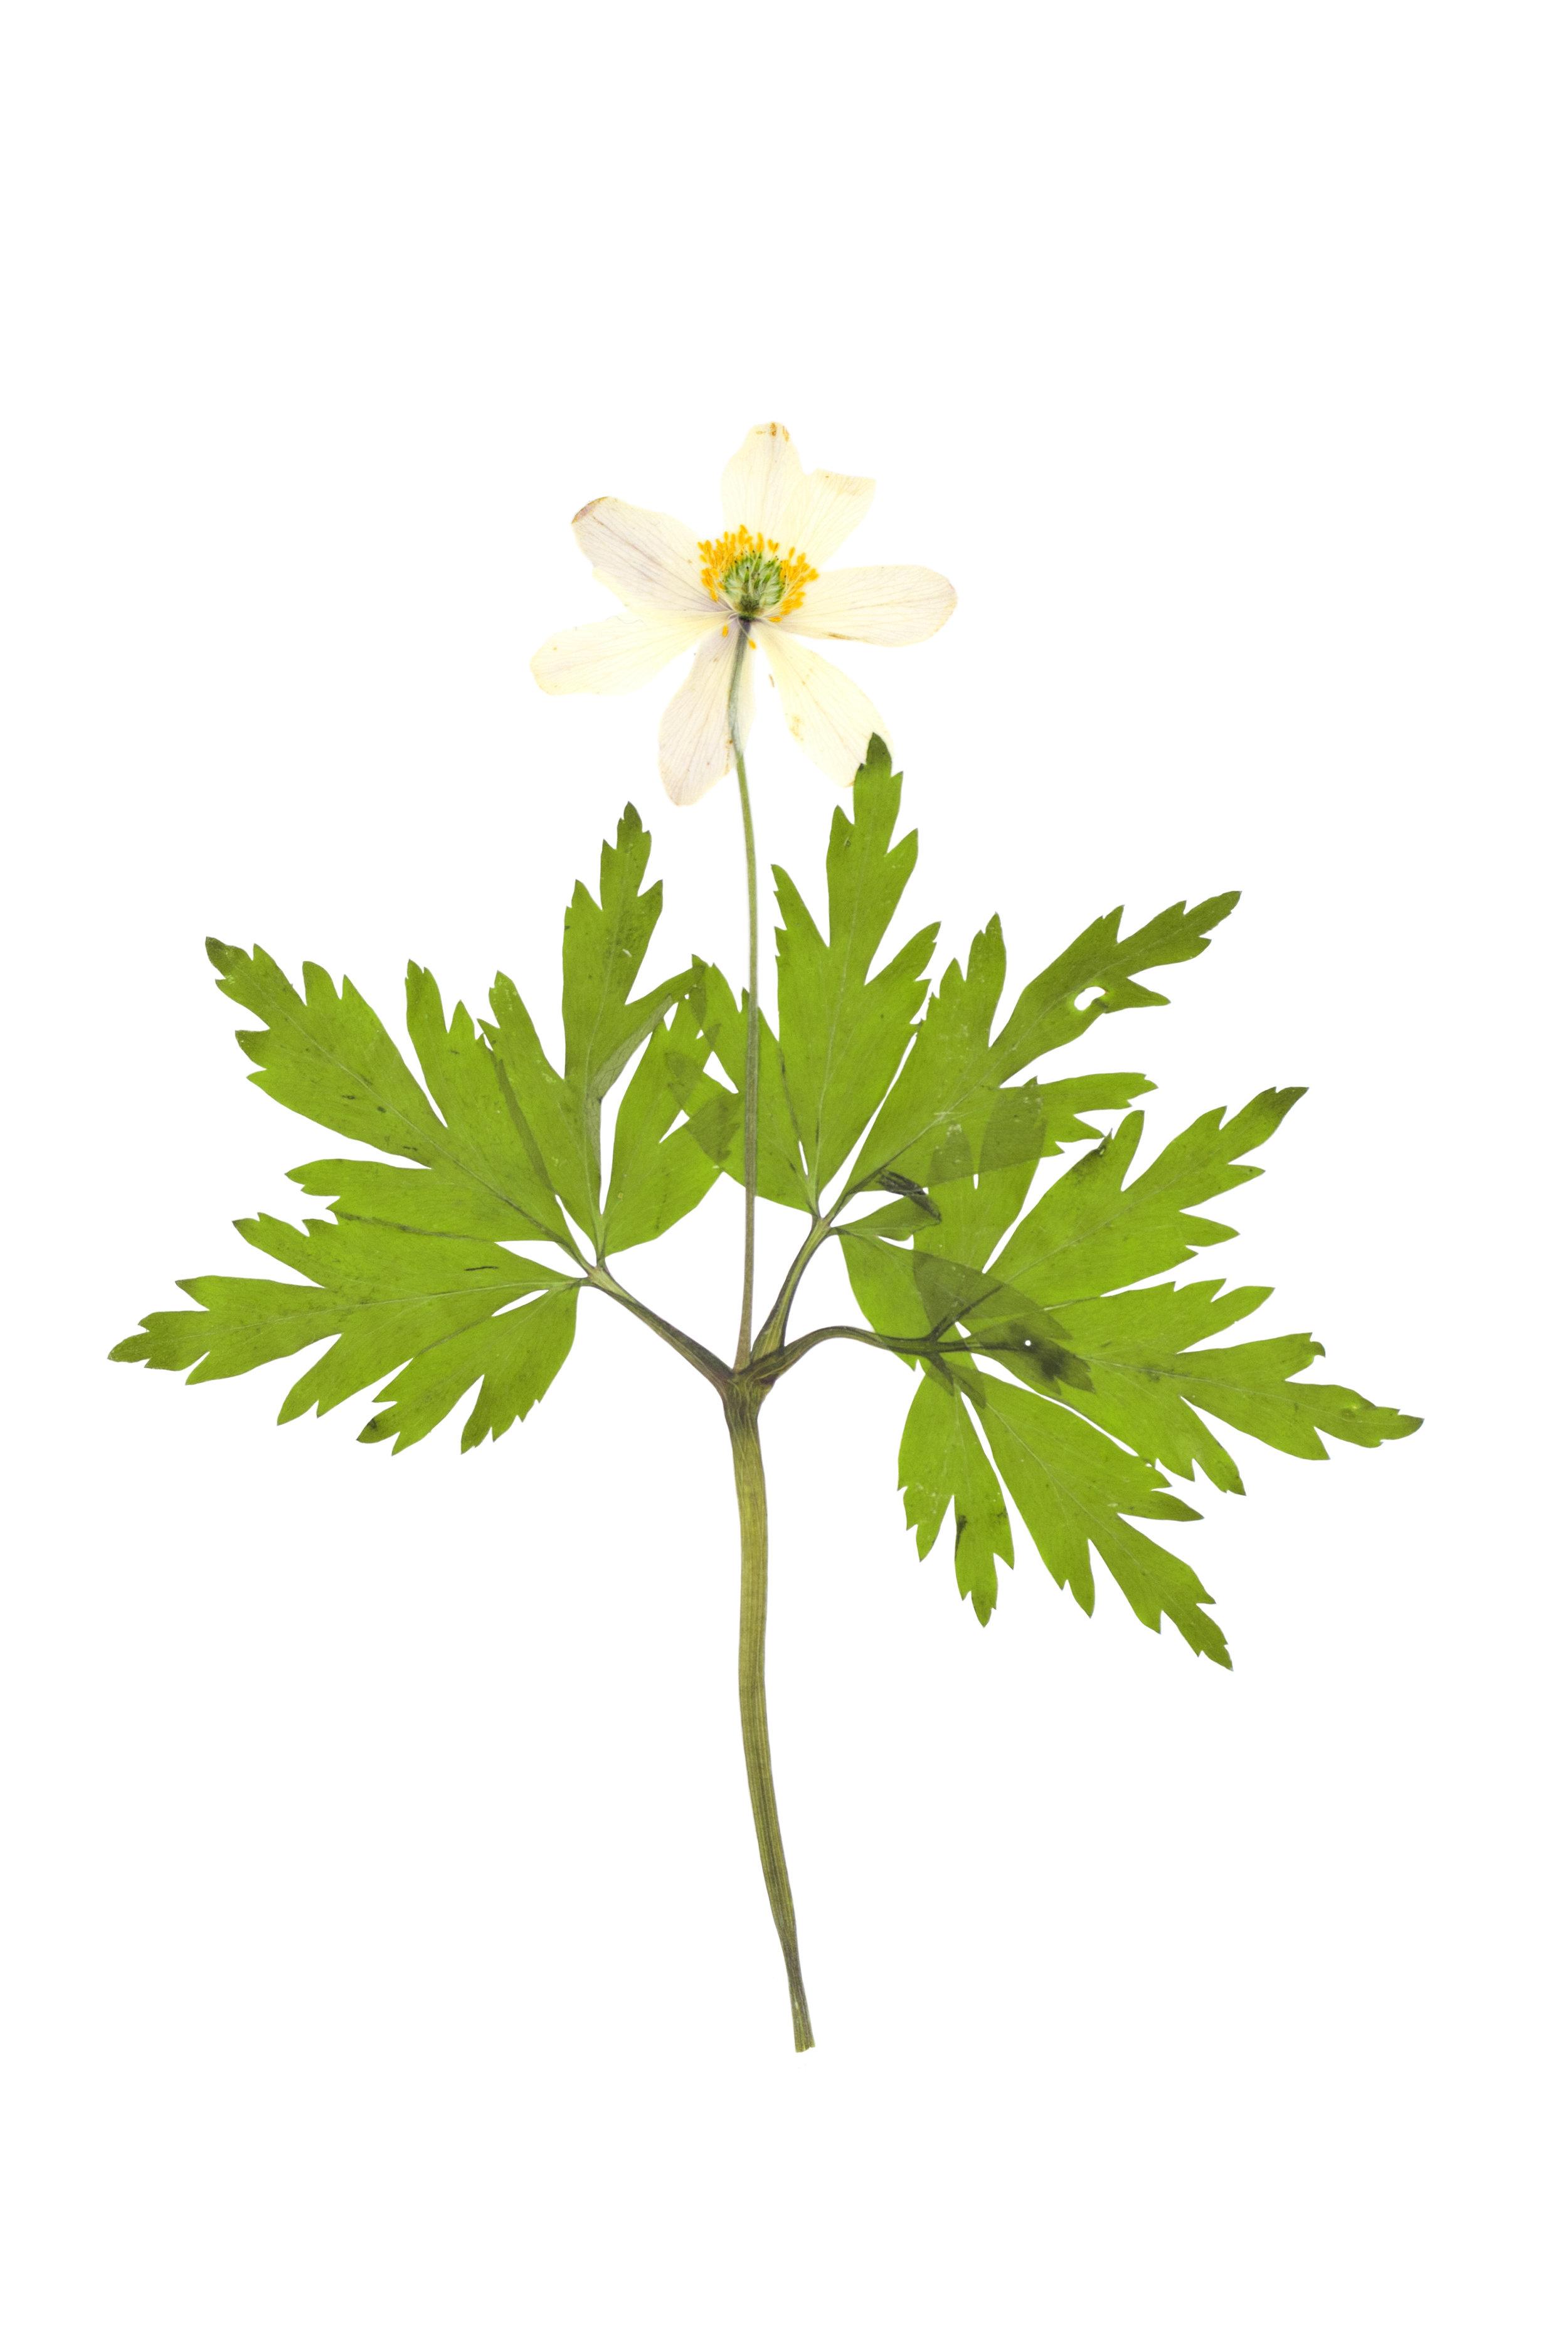 Wood Anemone / Anemone nemorosa